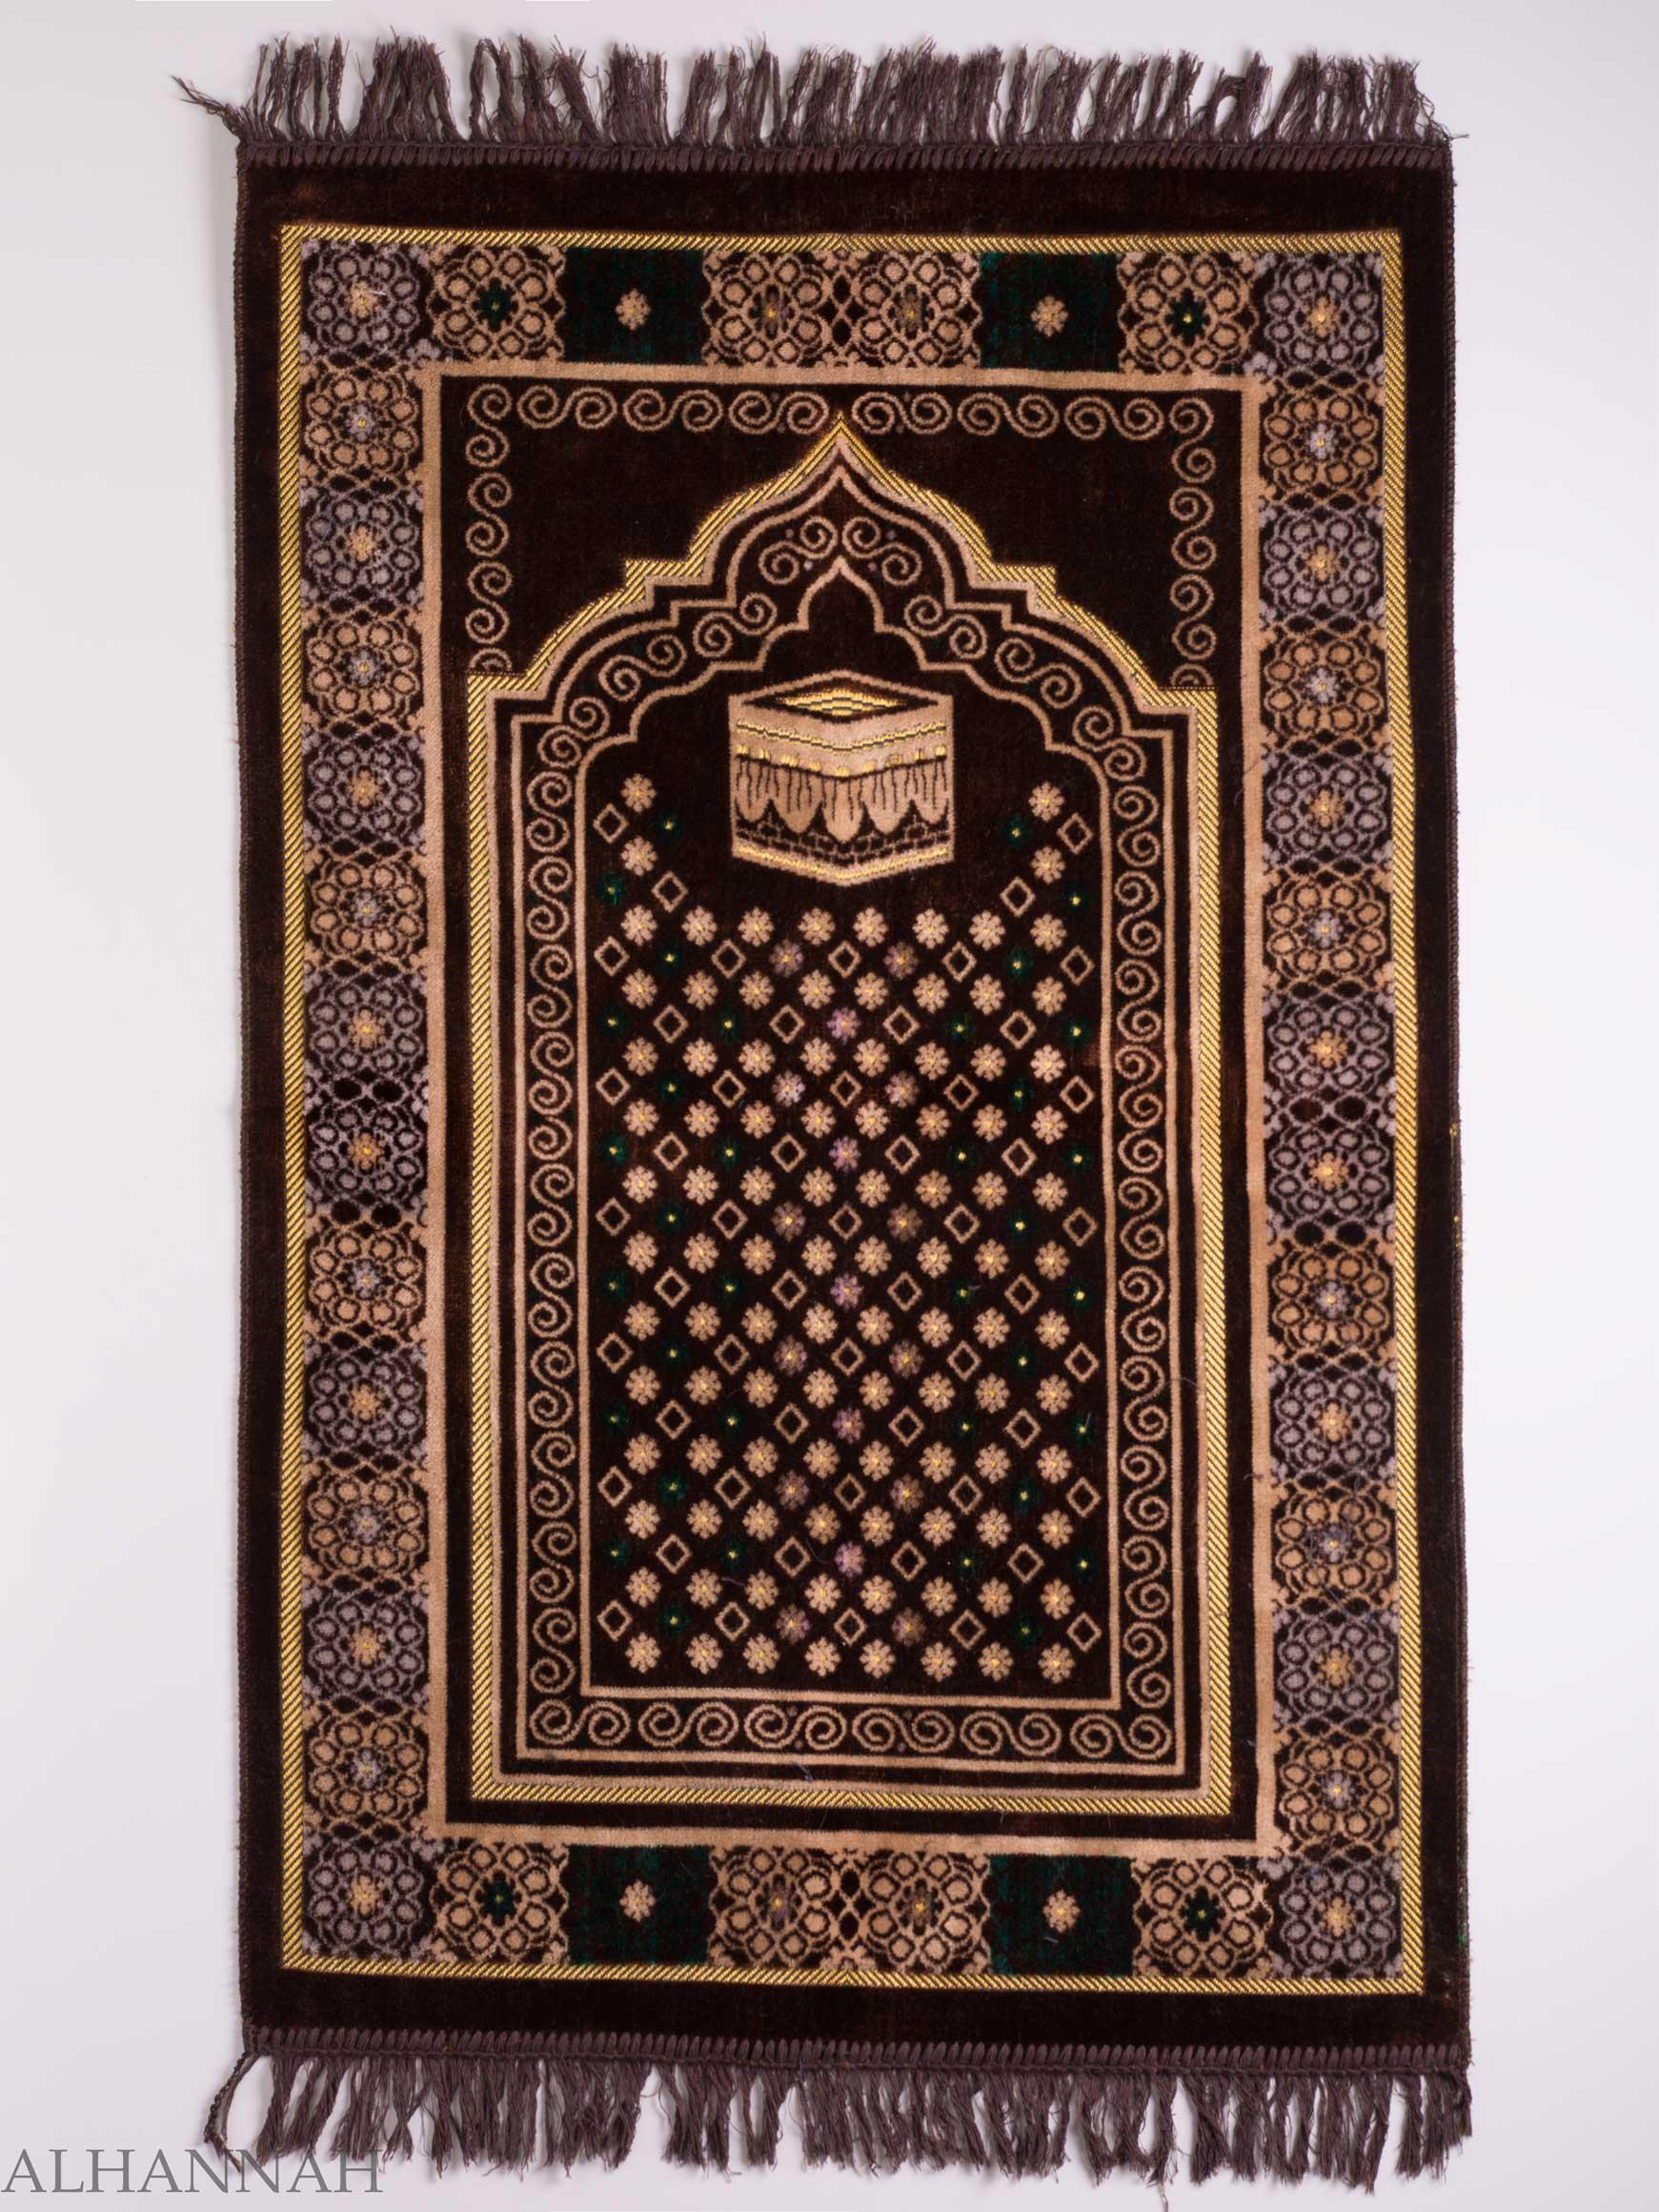 Turkish Prayer Rug Brown Floral Kaaba Motif ii1127